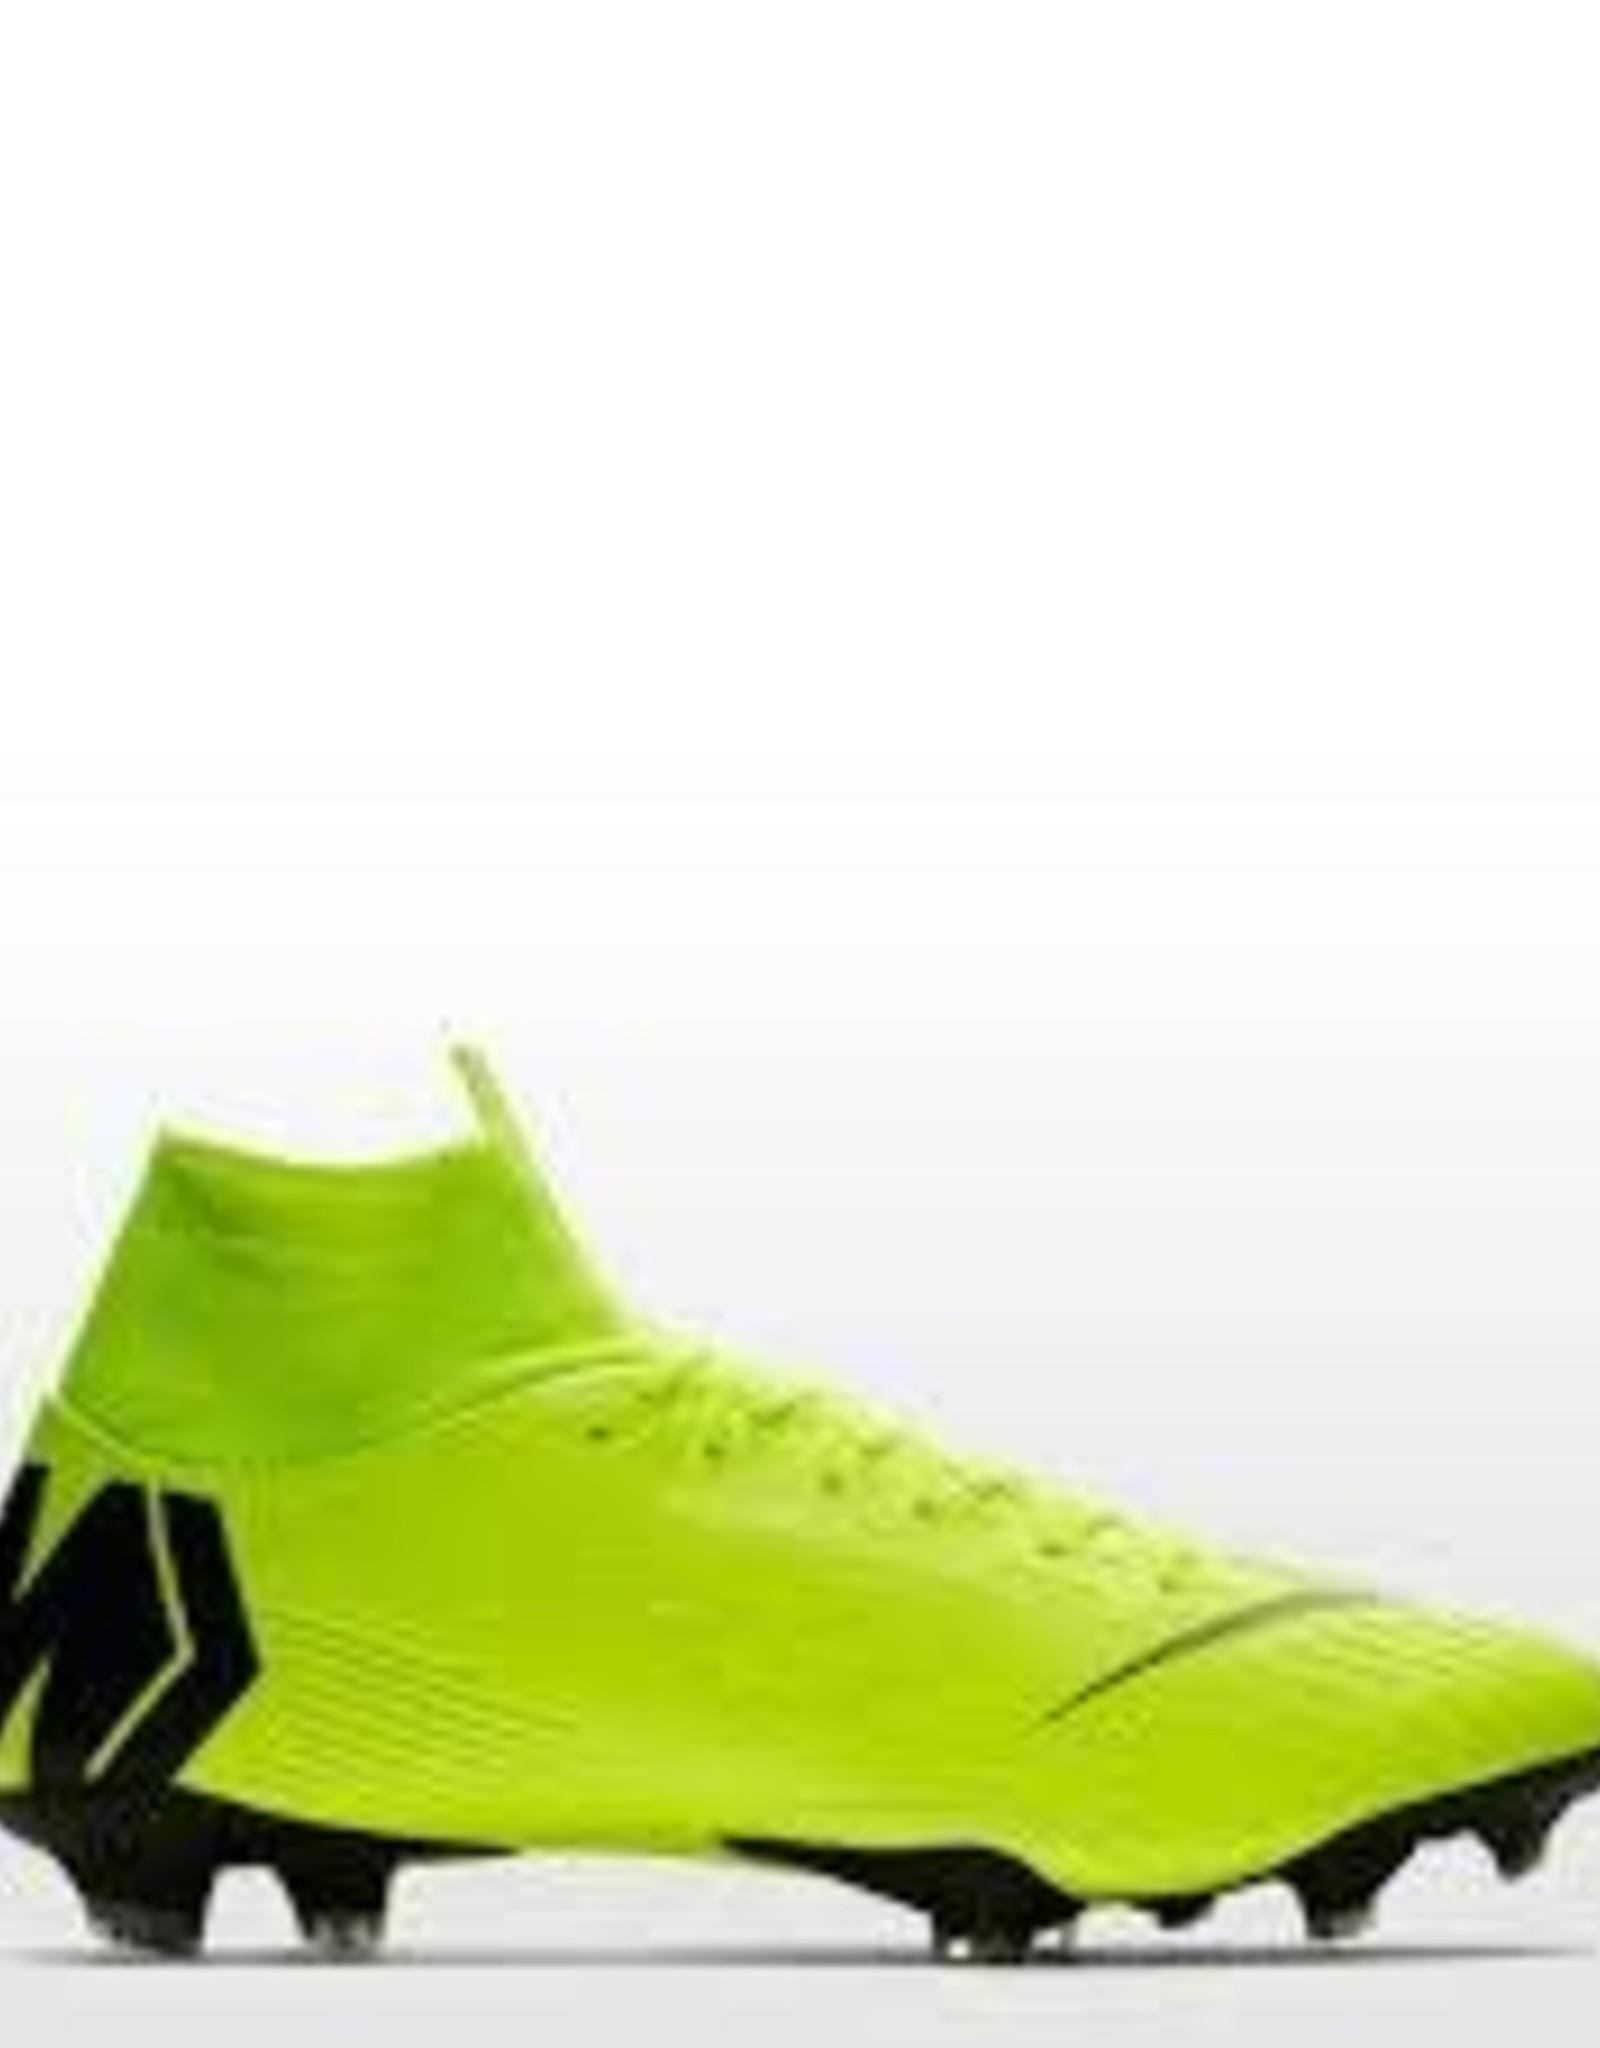 Nike Nike FG Superfly AH7368